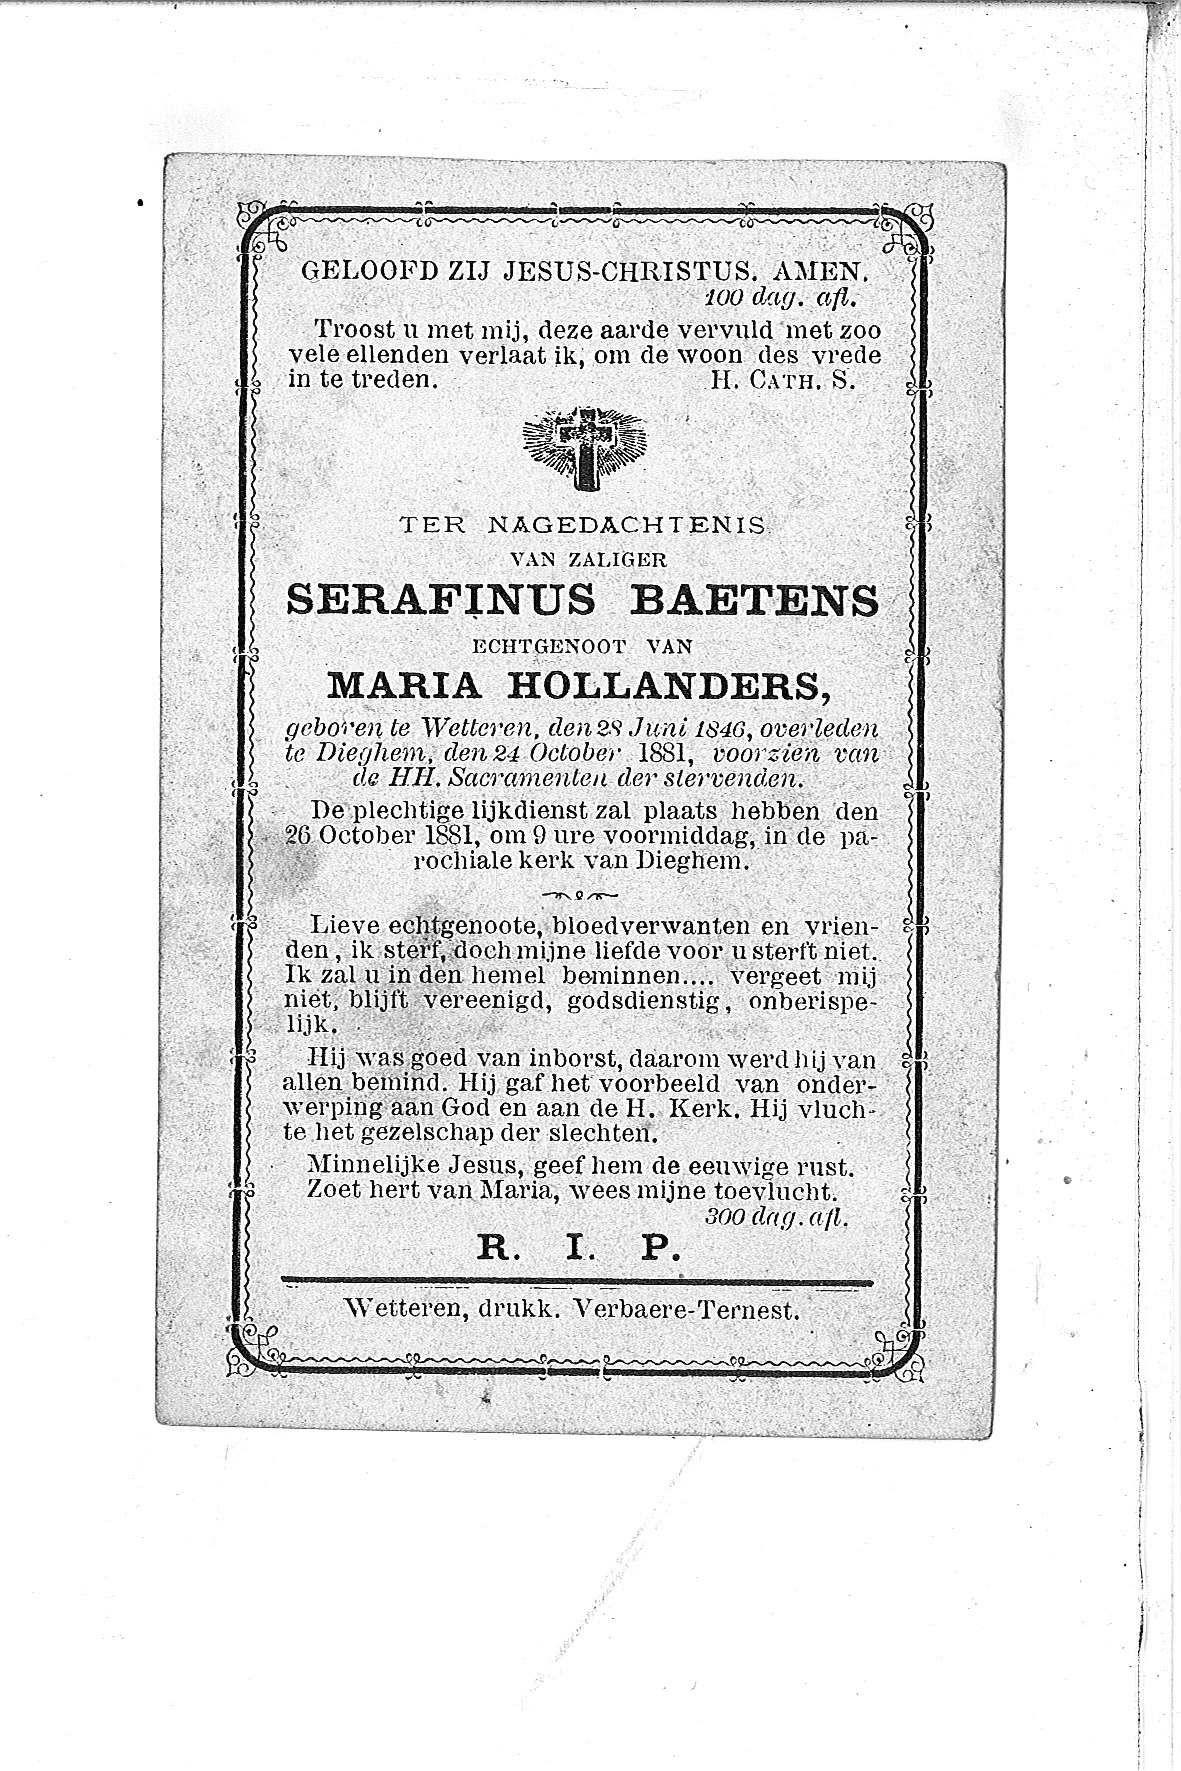 Serafinus(1881)20101004094730_00006.jpg